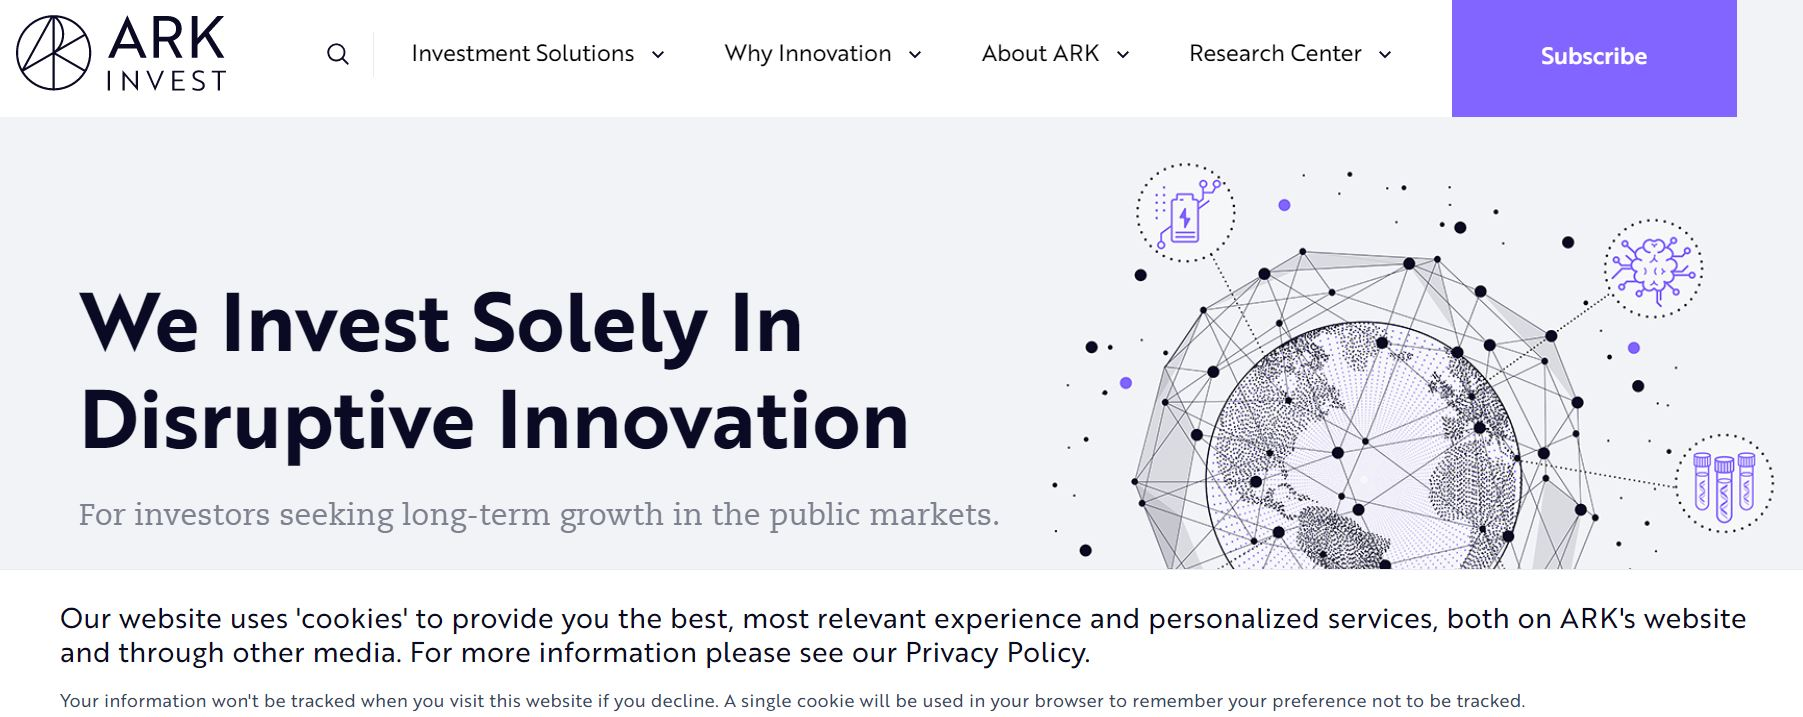 https://ark-invest.com/